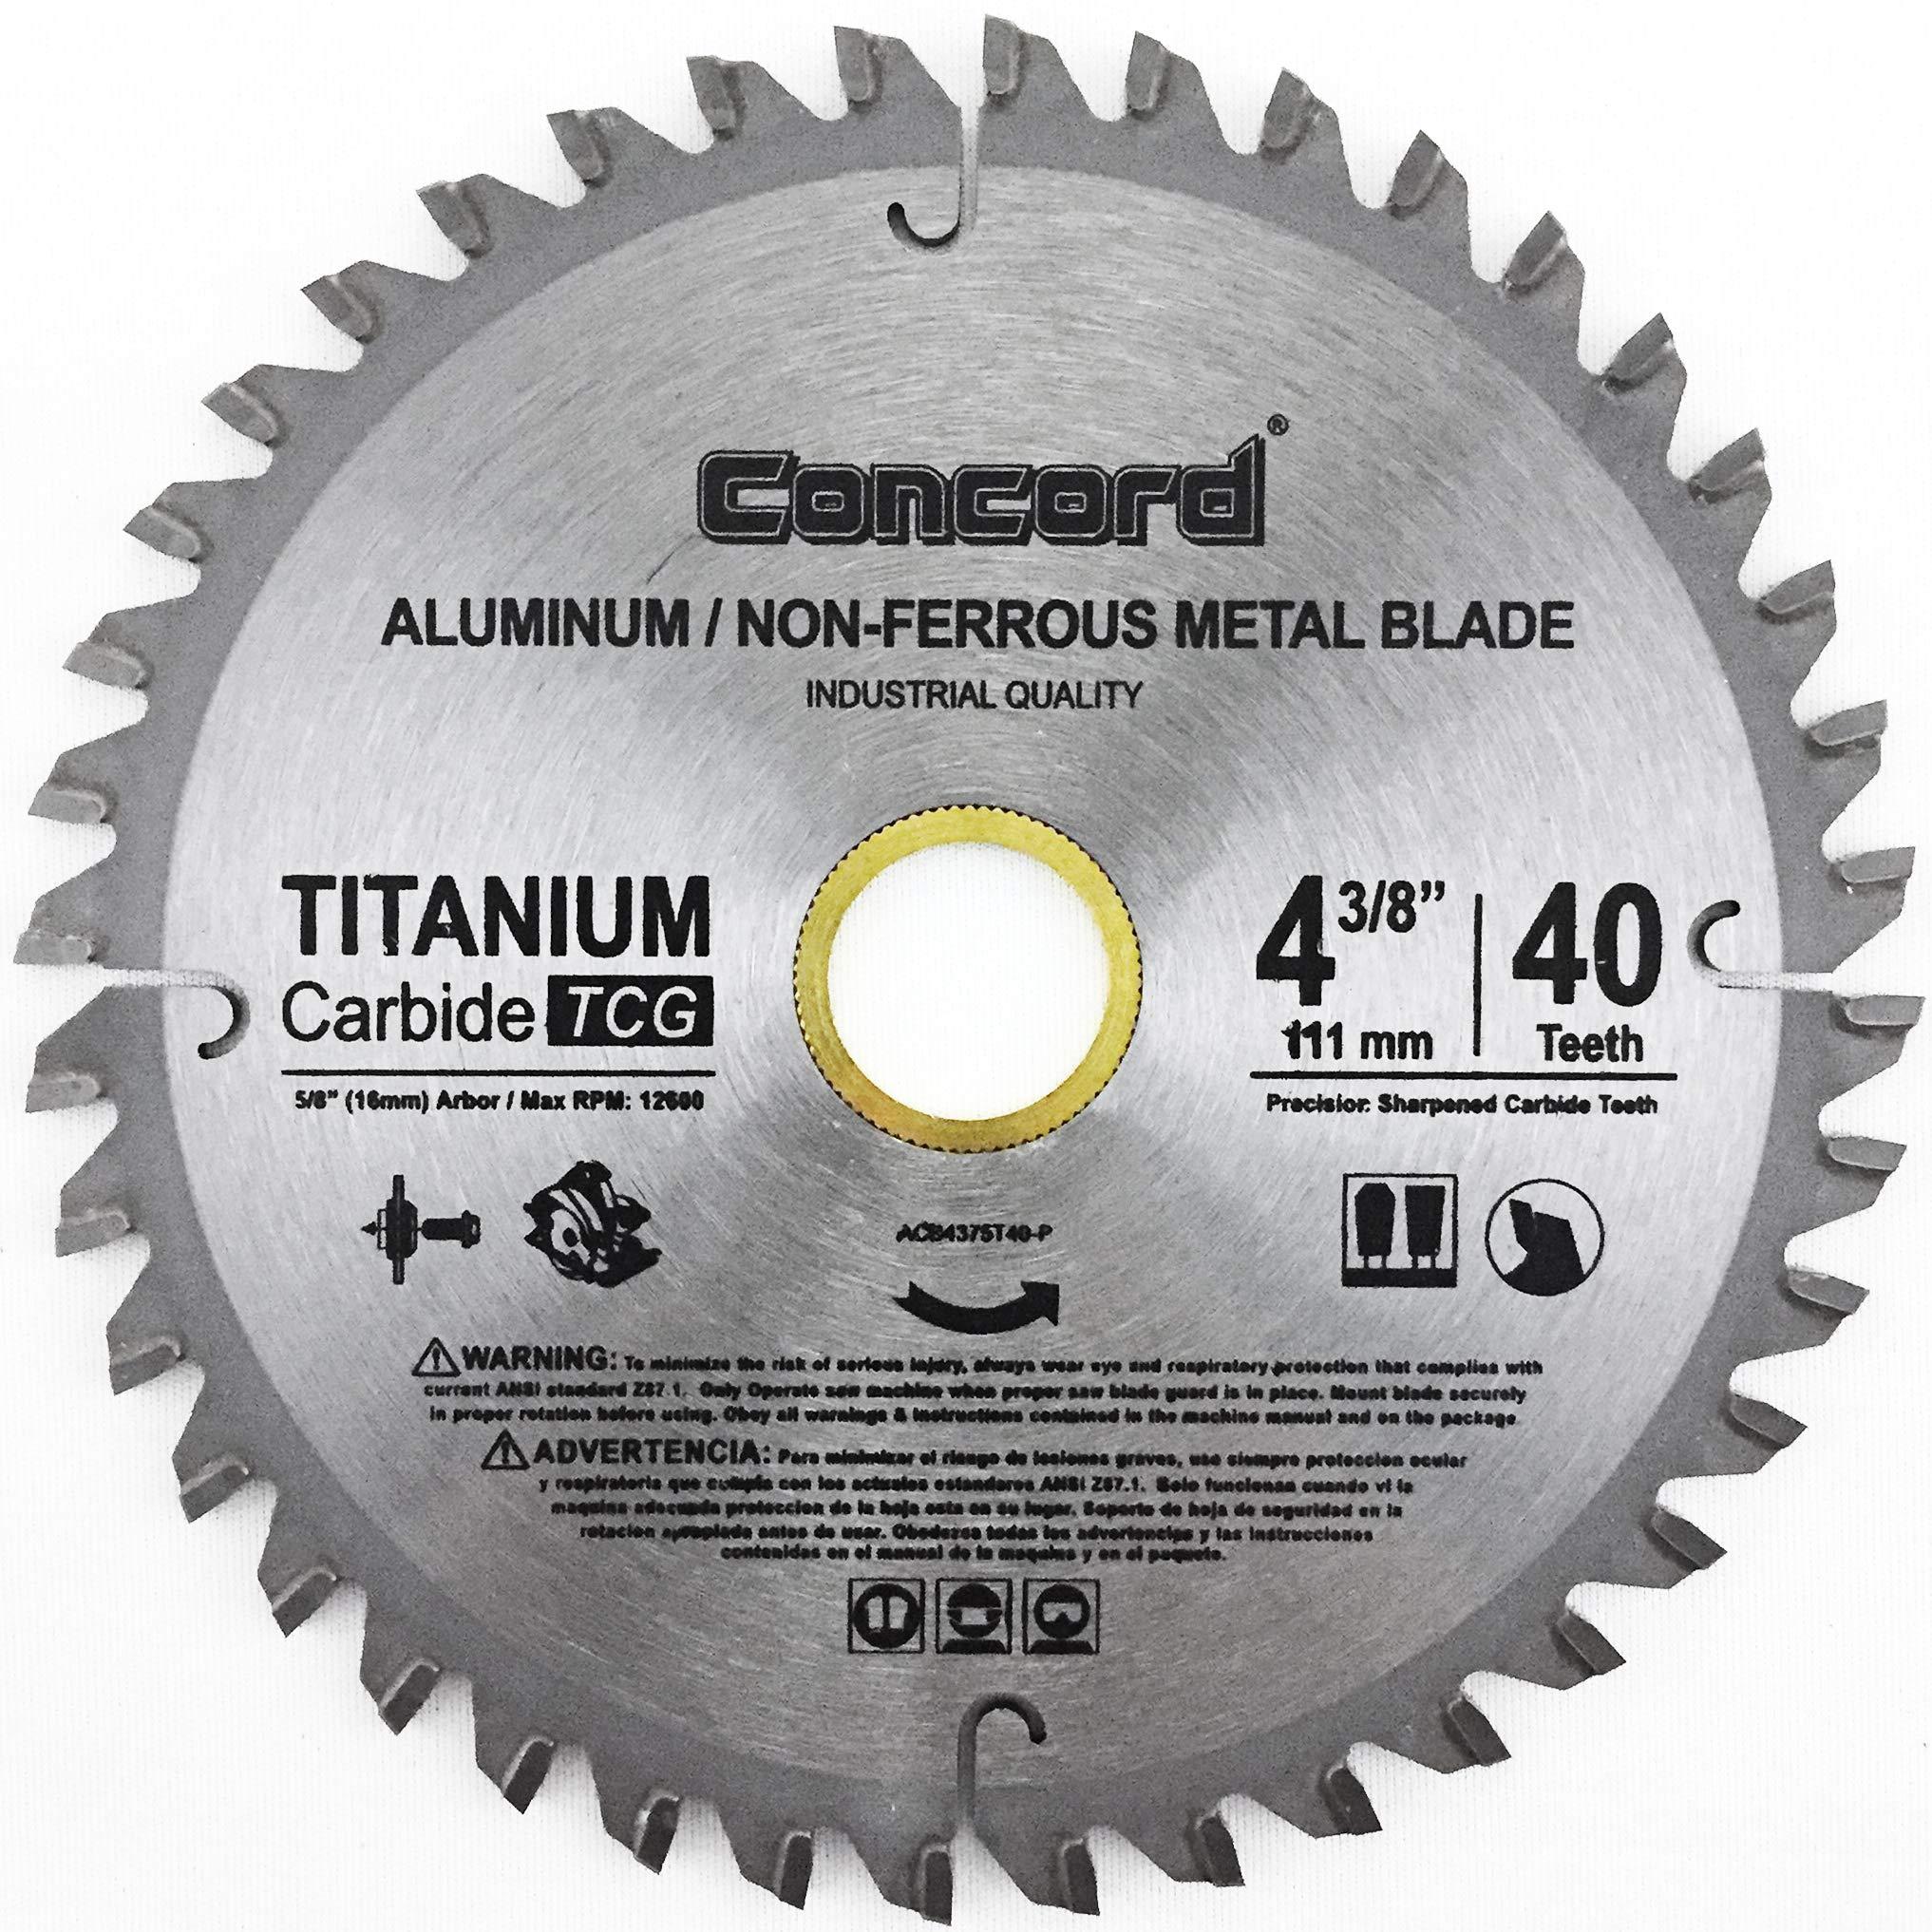 Concord Blades Acb0438t040hp 4 3 8 Inch 40 Teeth Tct Non Ferrous Metal Saw Blade Amazon Com